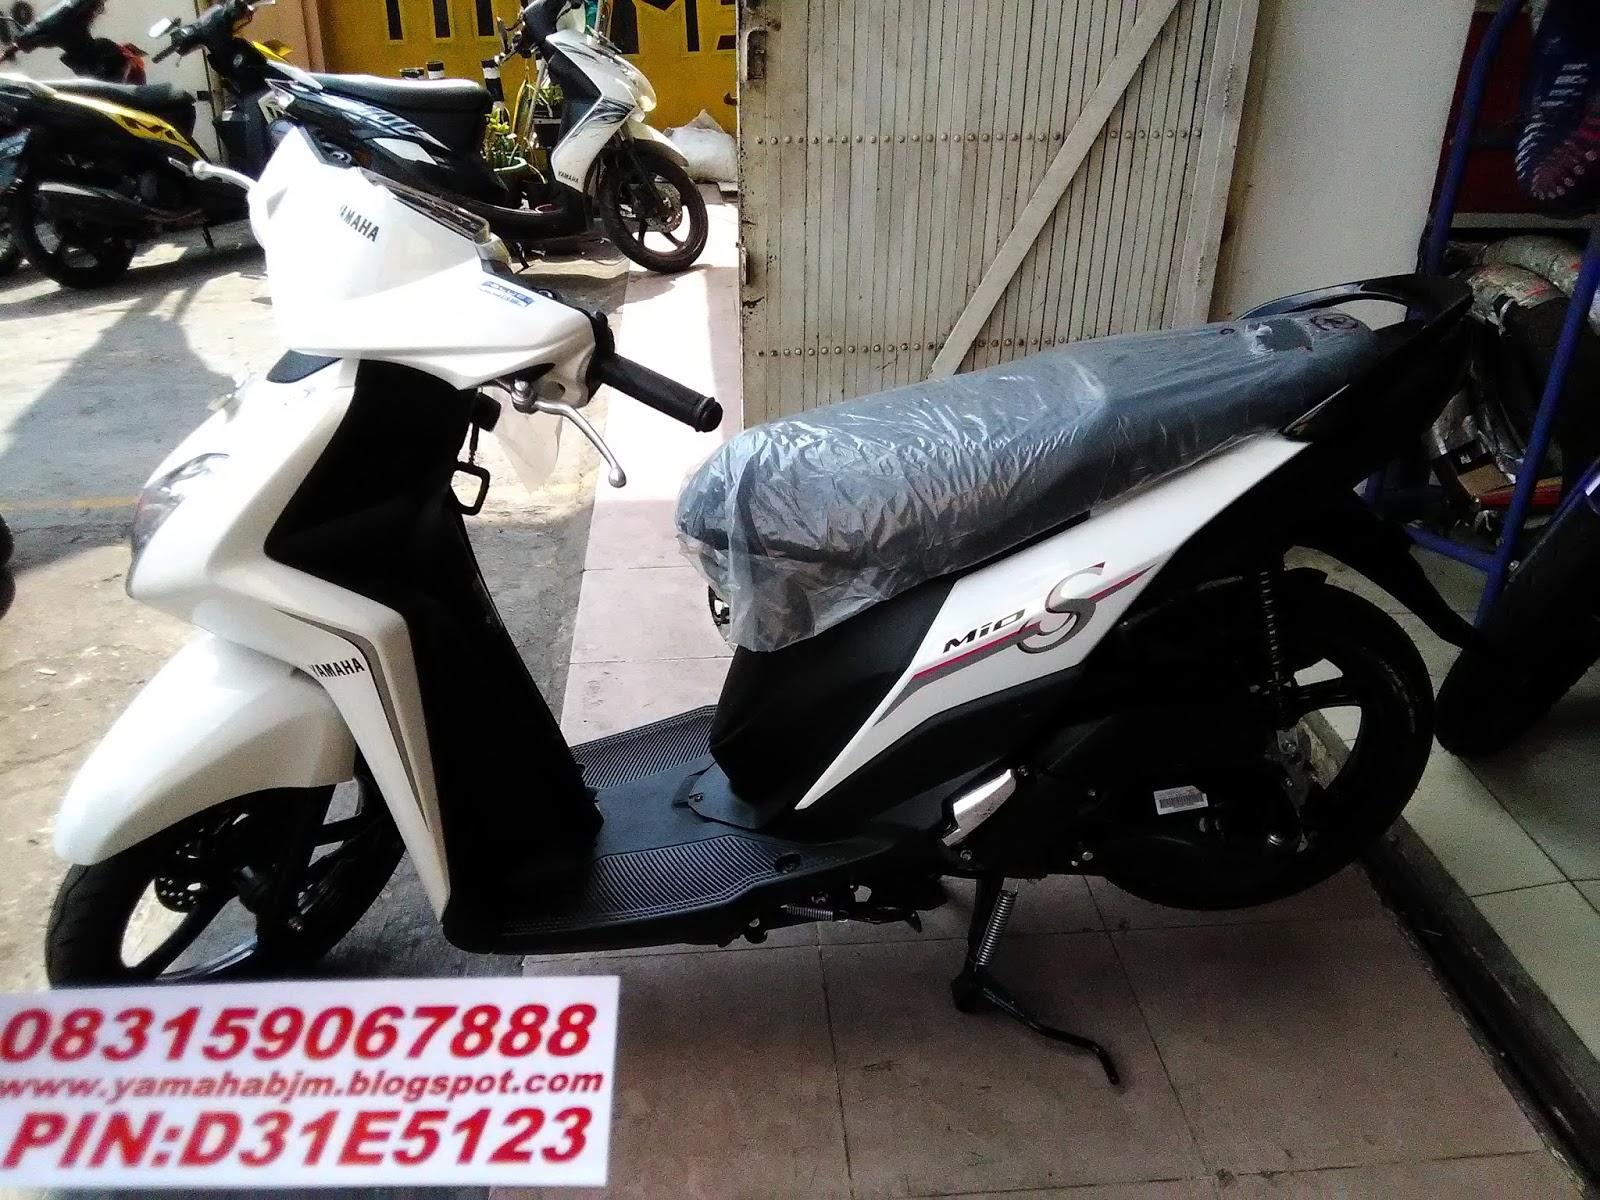 Jual Sparepart Asli Motor Yamaha Banjarmasin Dealer Resmi Spion Mio Harga S 125 Blue Core Dan Paling Murah Lengkap Di 083159067888 Bb Pin Verdyy